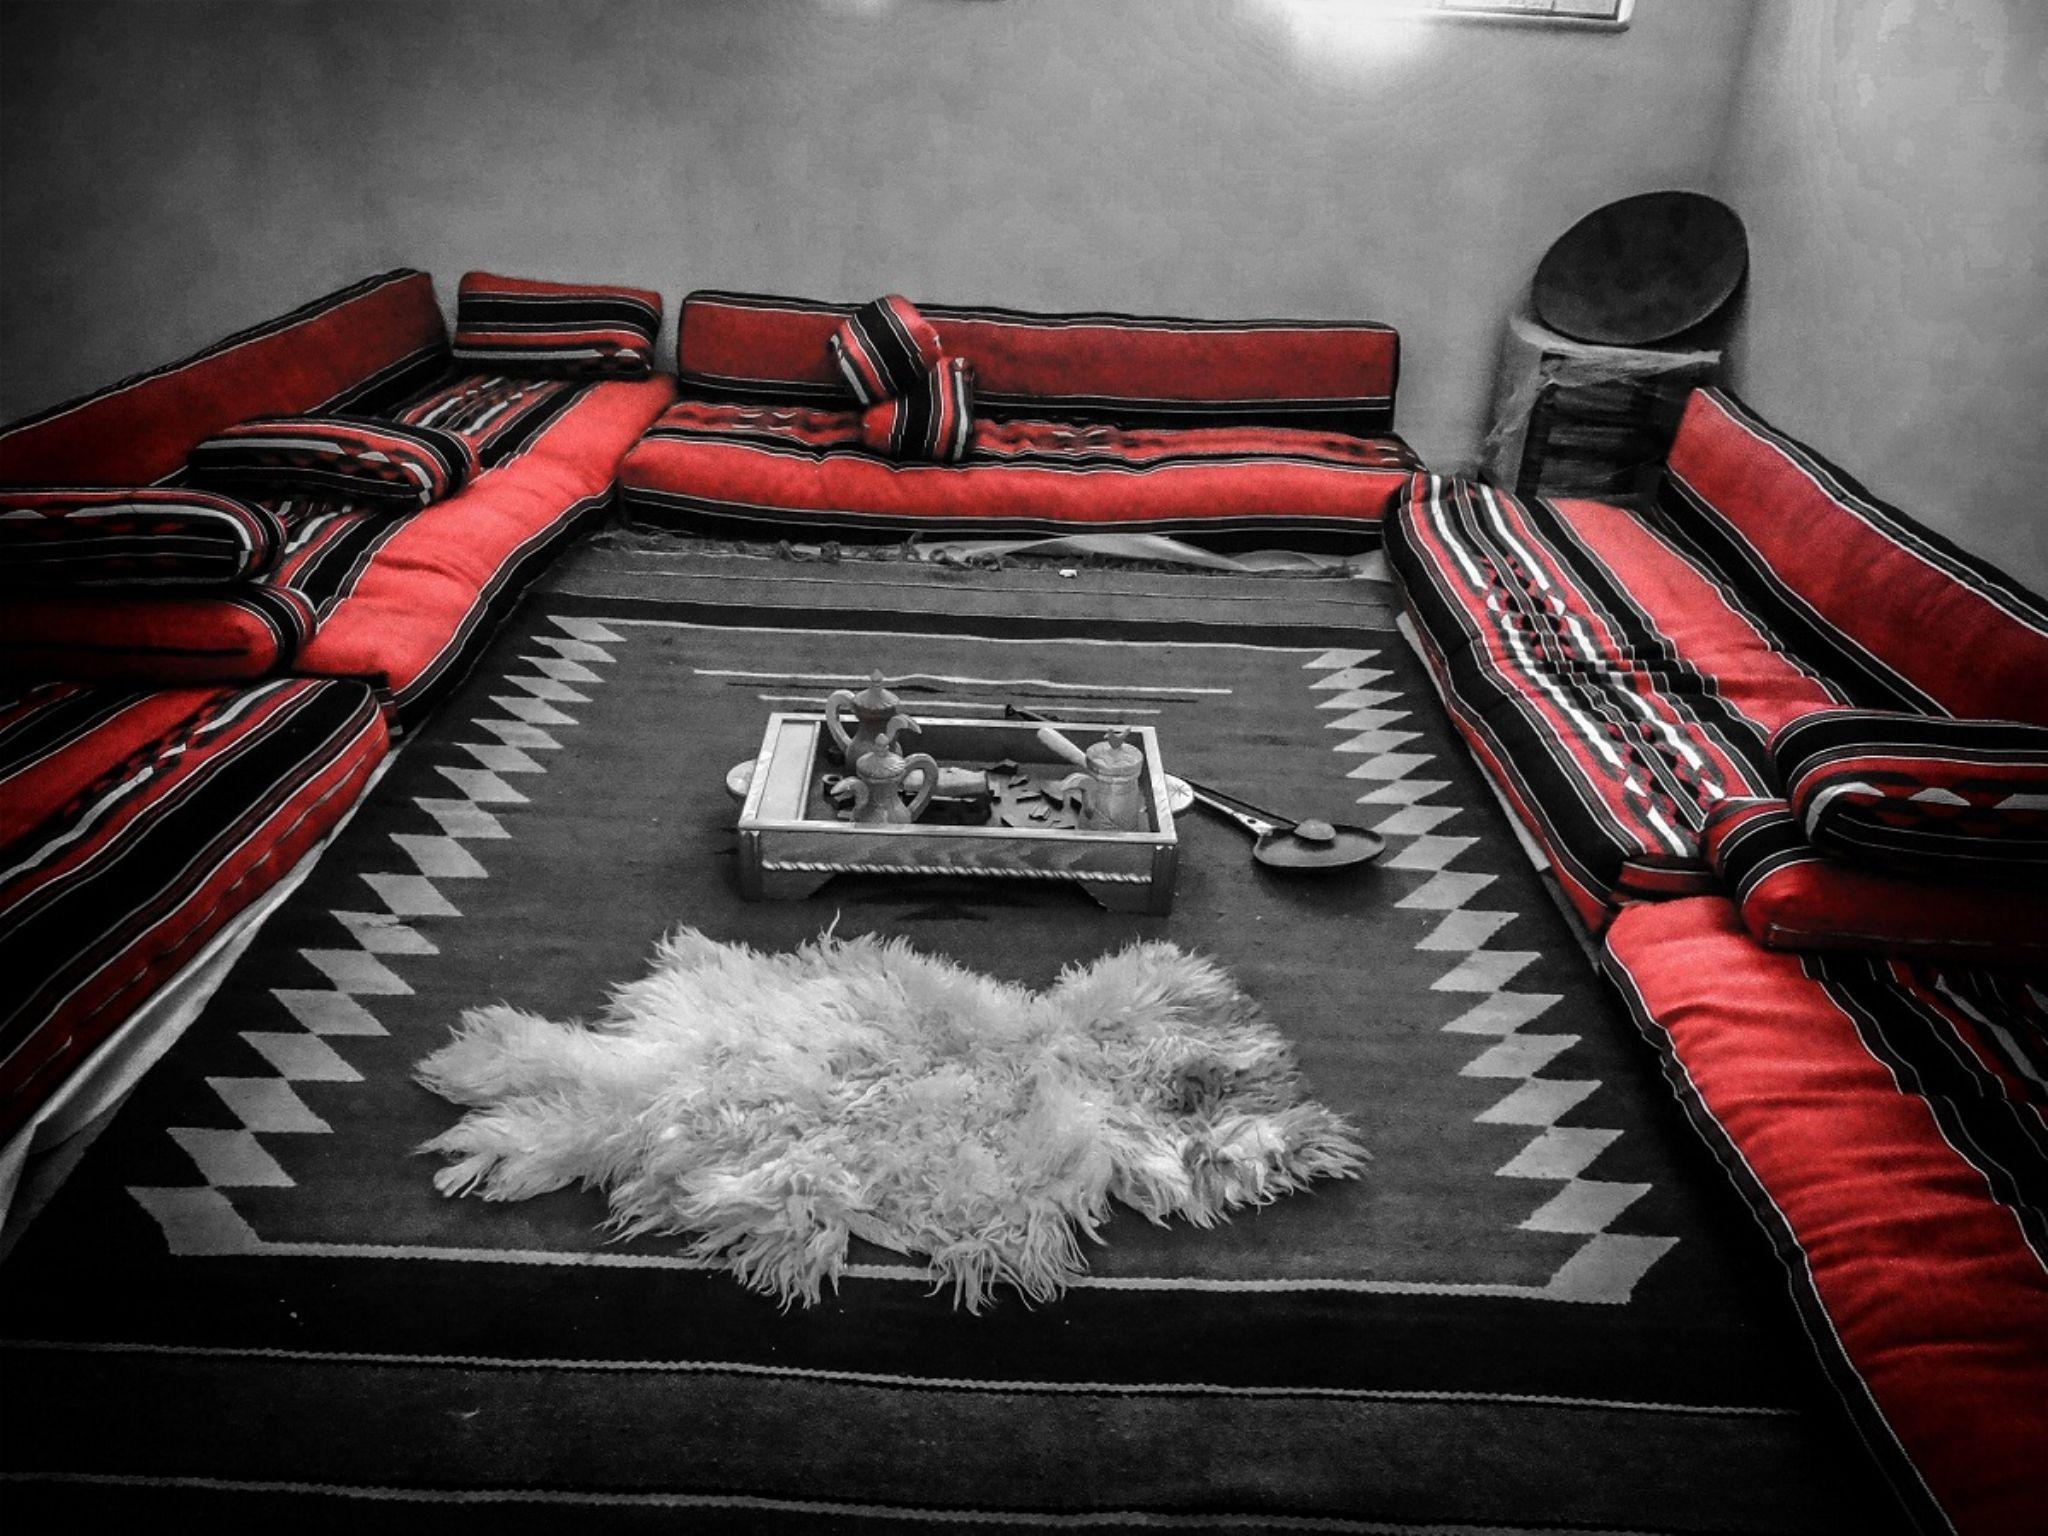 Alnabelsi Hospitality Room by Husam Libad